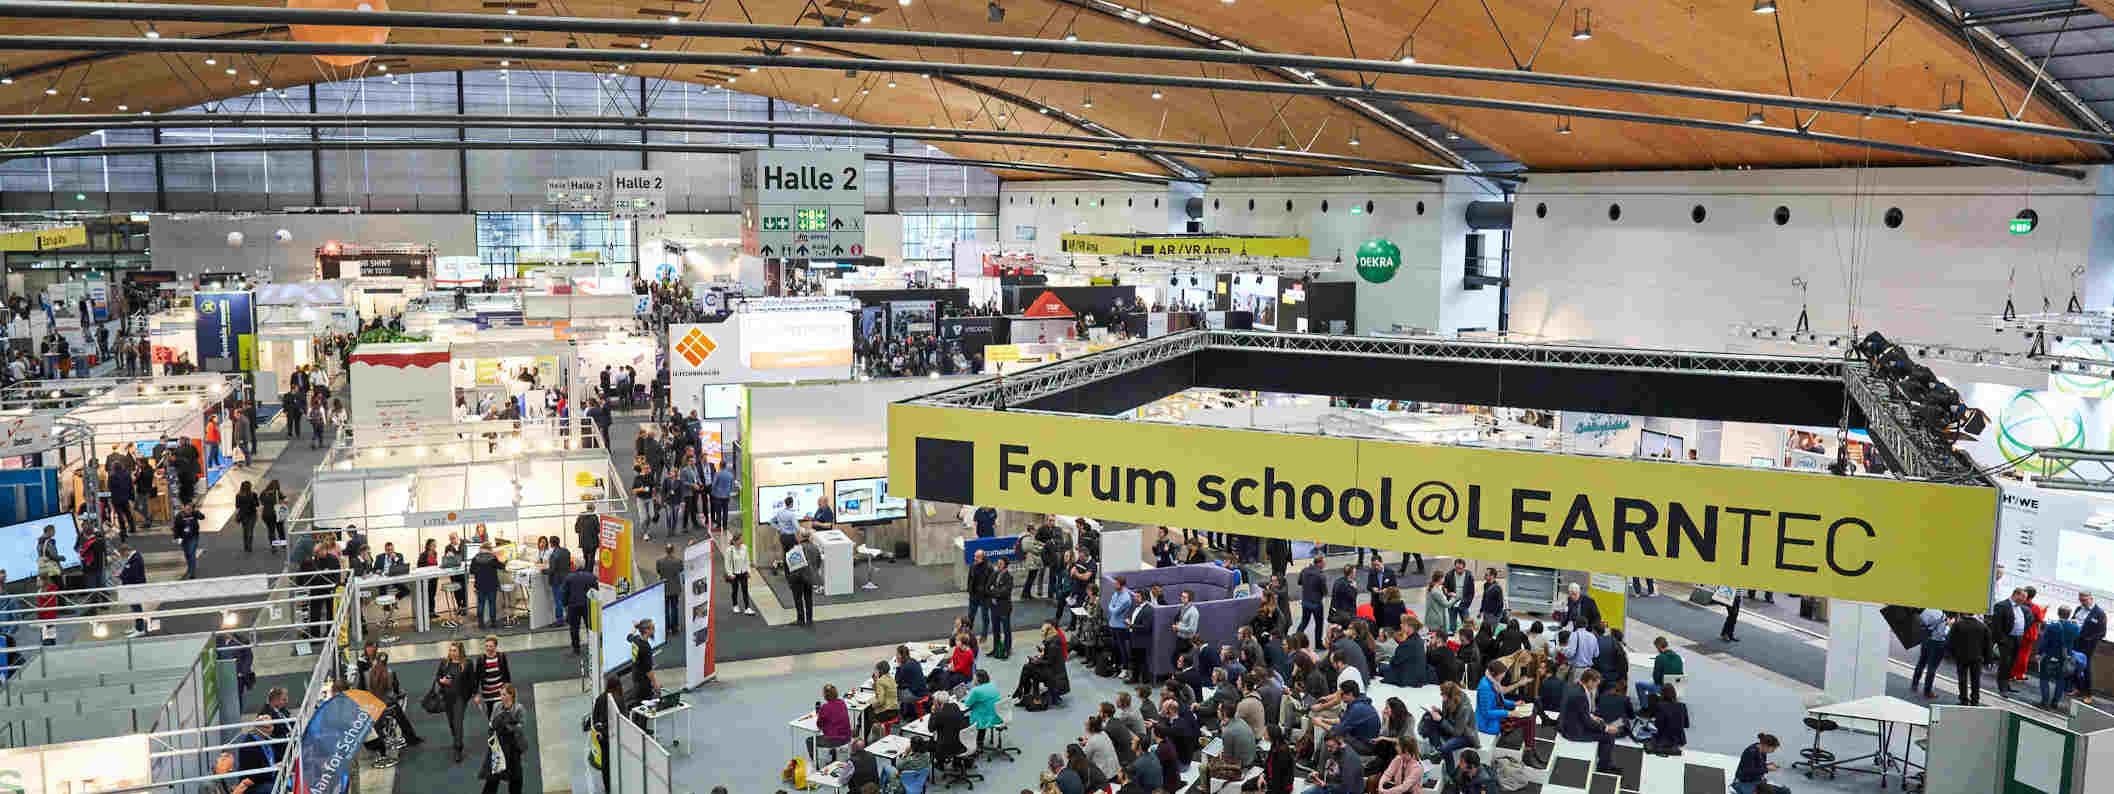 LEARNTEC 2019: Fachmesse für digitales Lernen